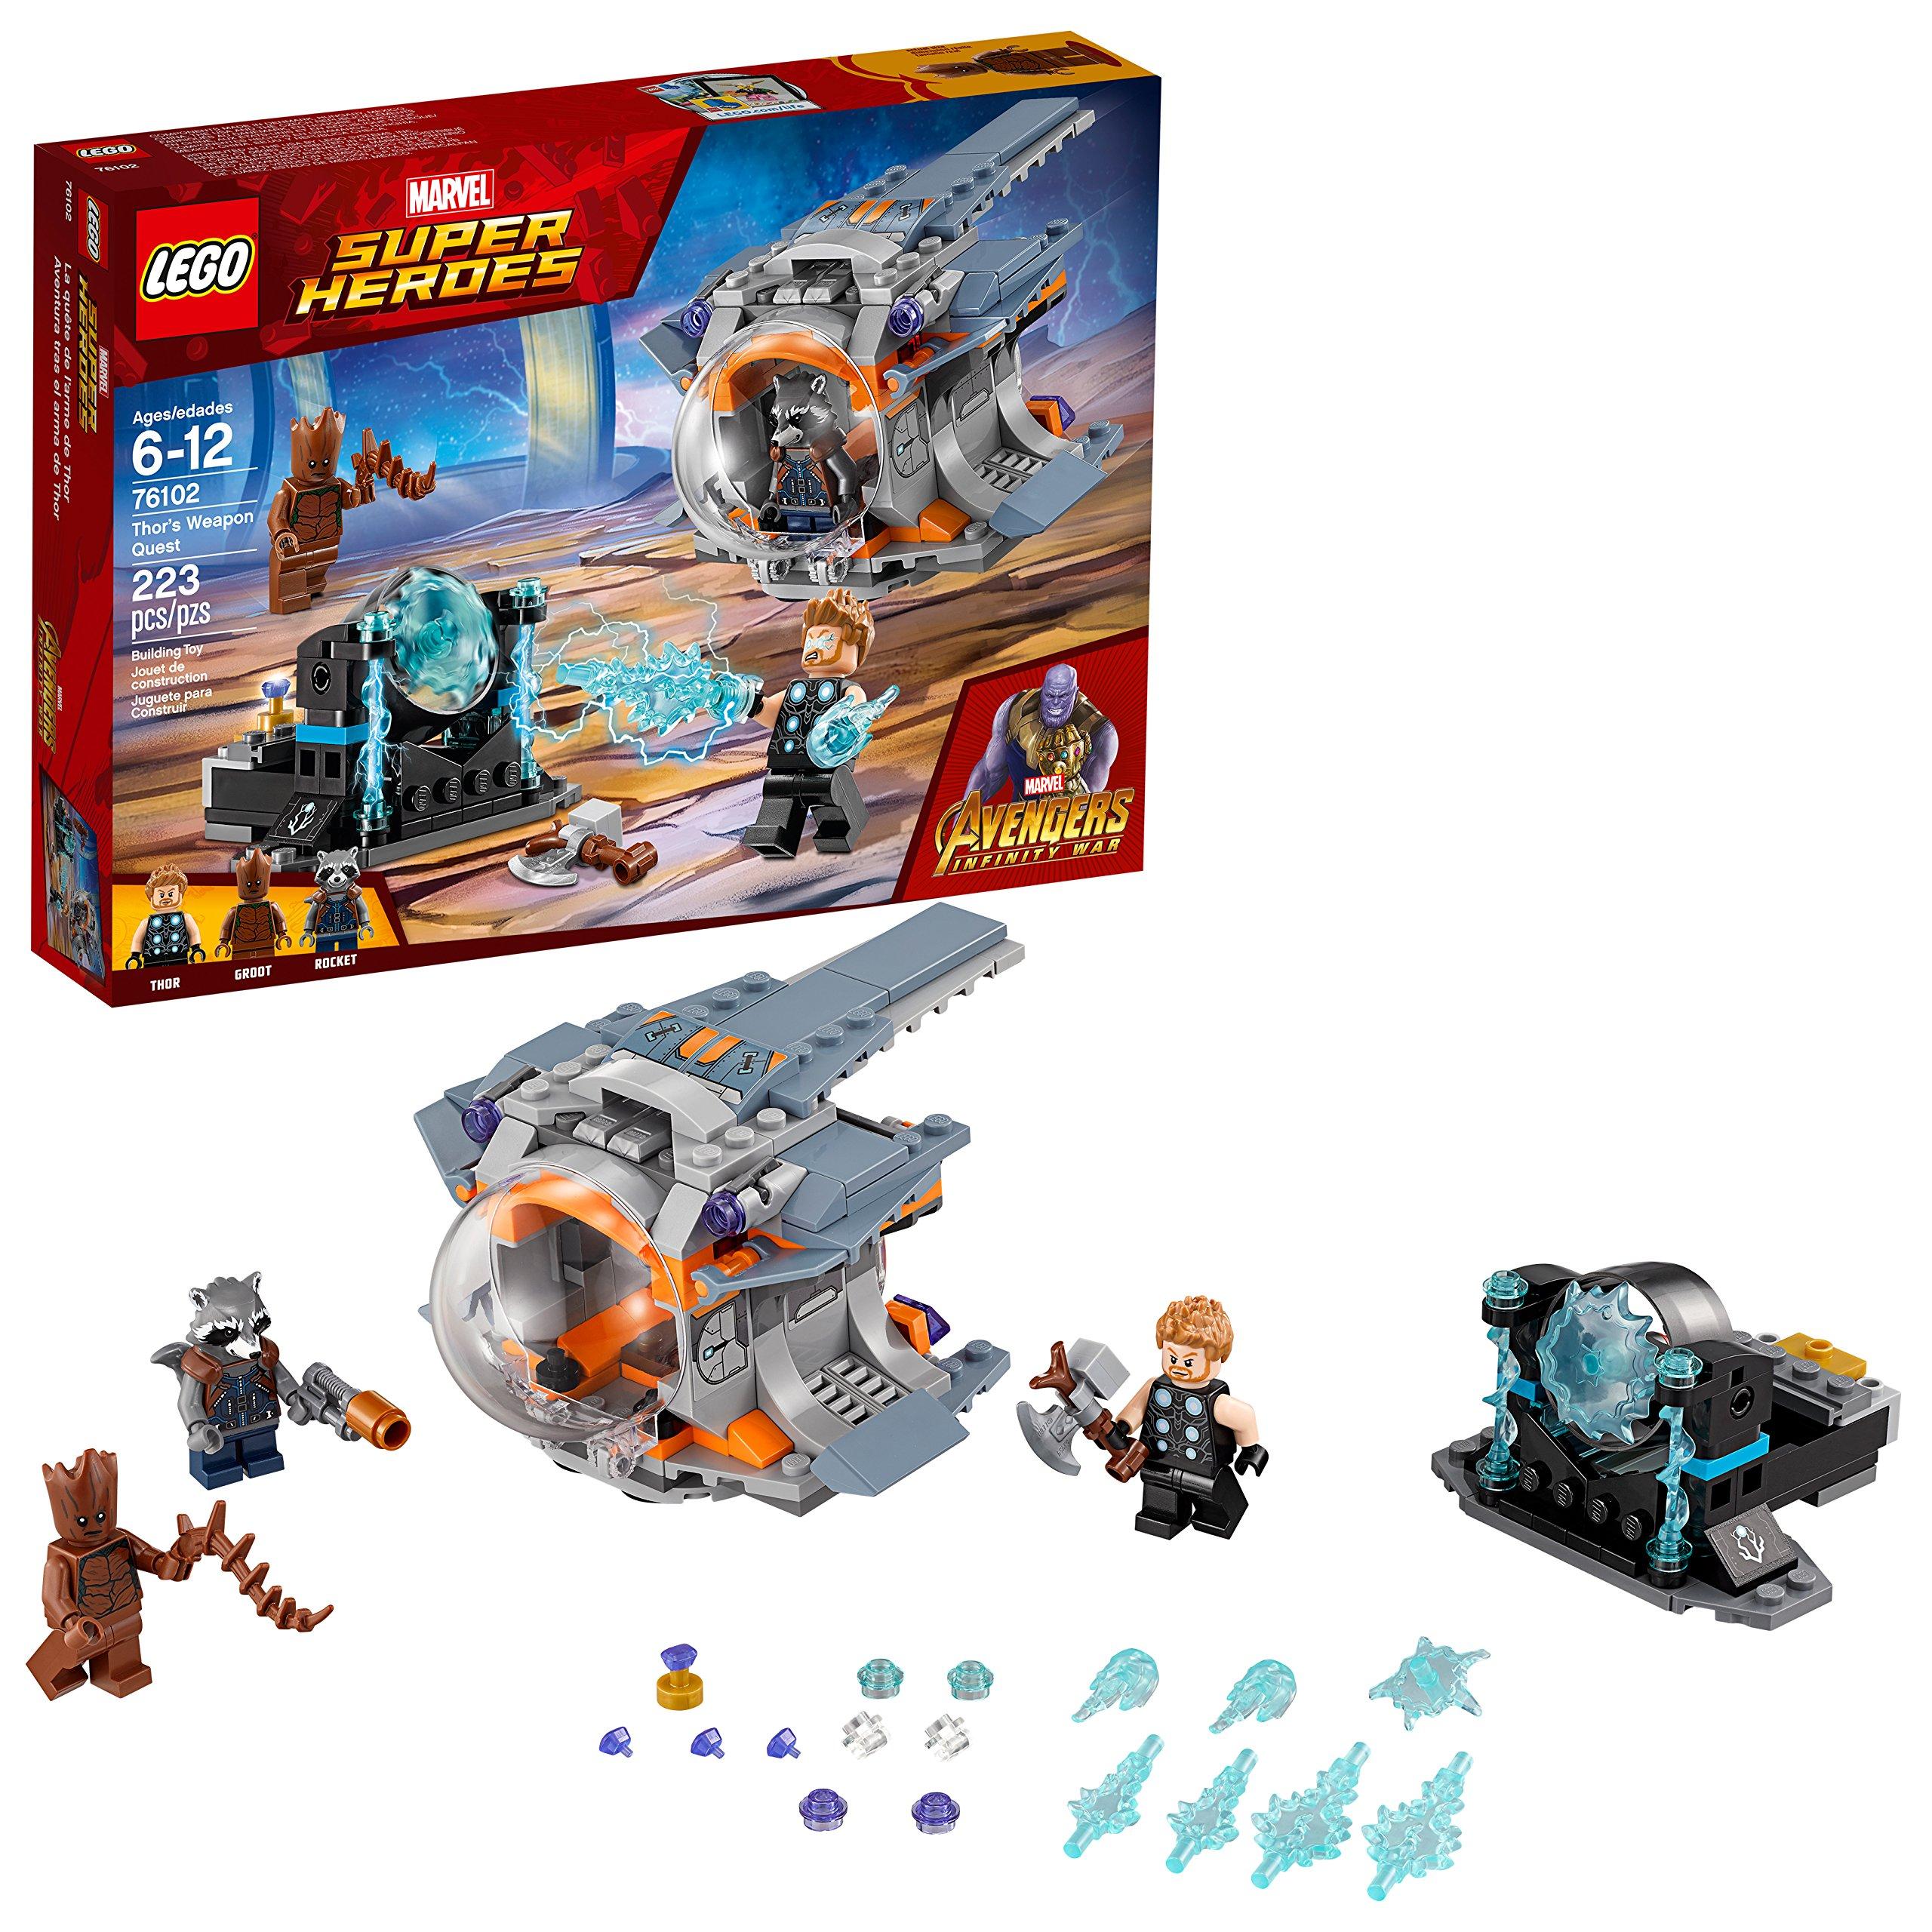 Buy Avengers Infinity War Super Heroes Marvel Lego Now!